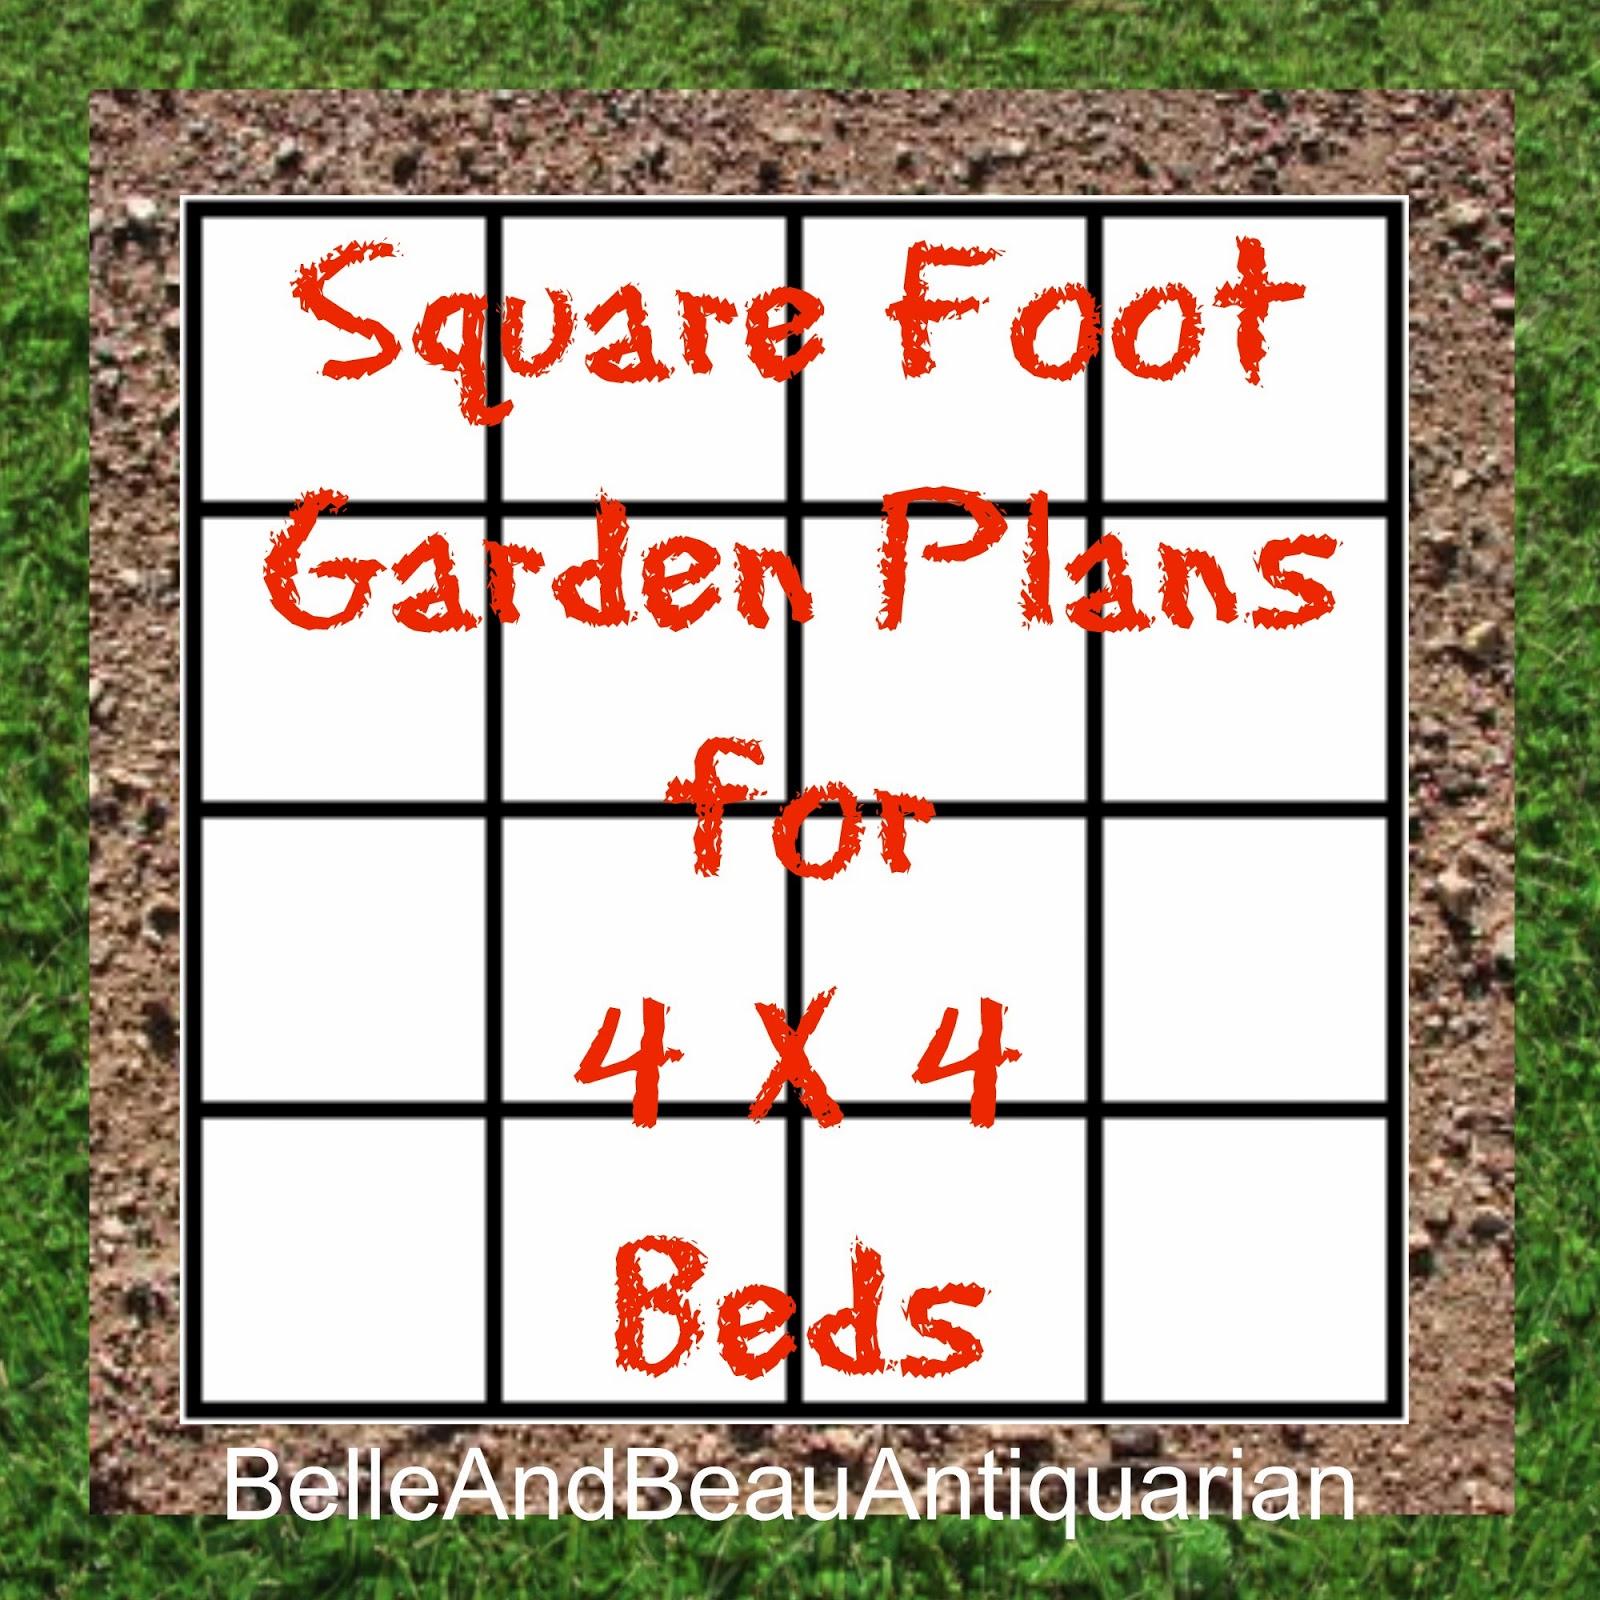 Belle Beau Antiquarian Square Foot Garden Plans for 4 x 4 Beds – Square Foot Garden Plans